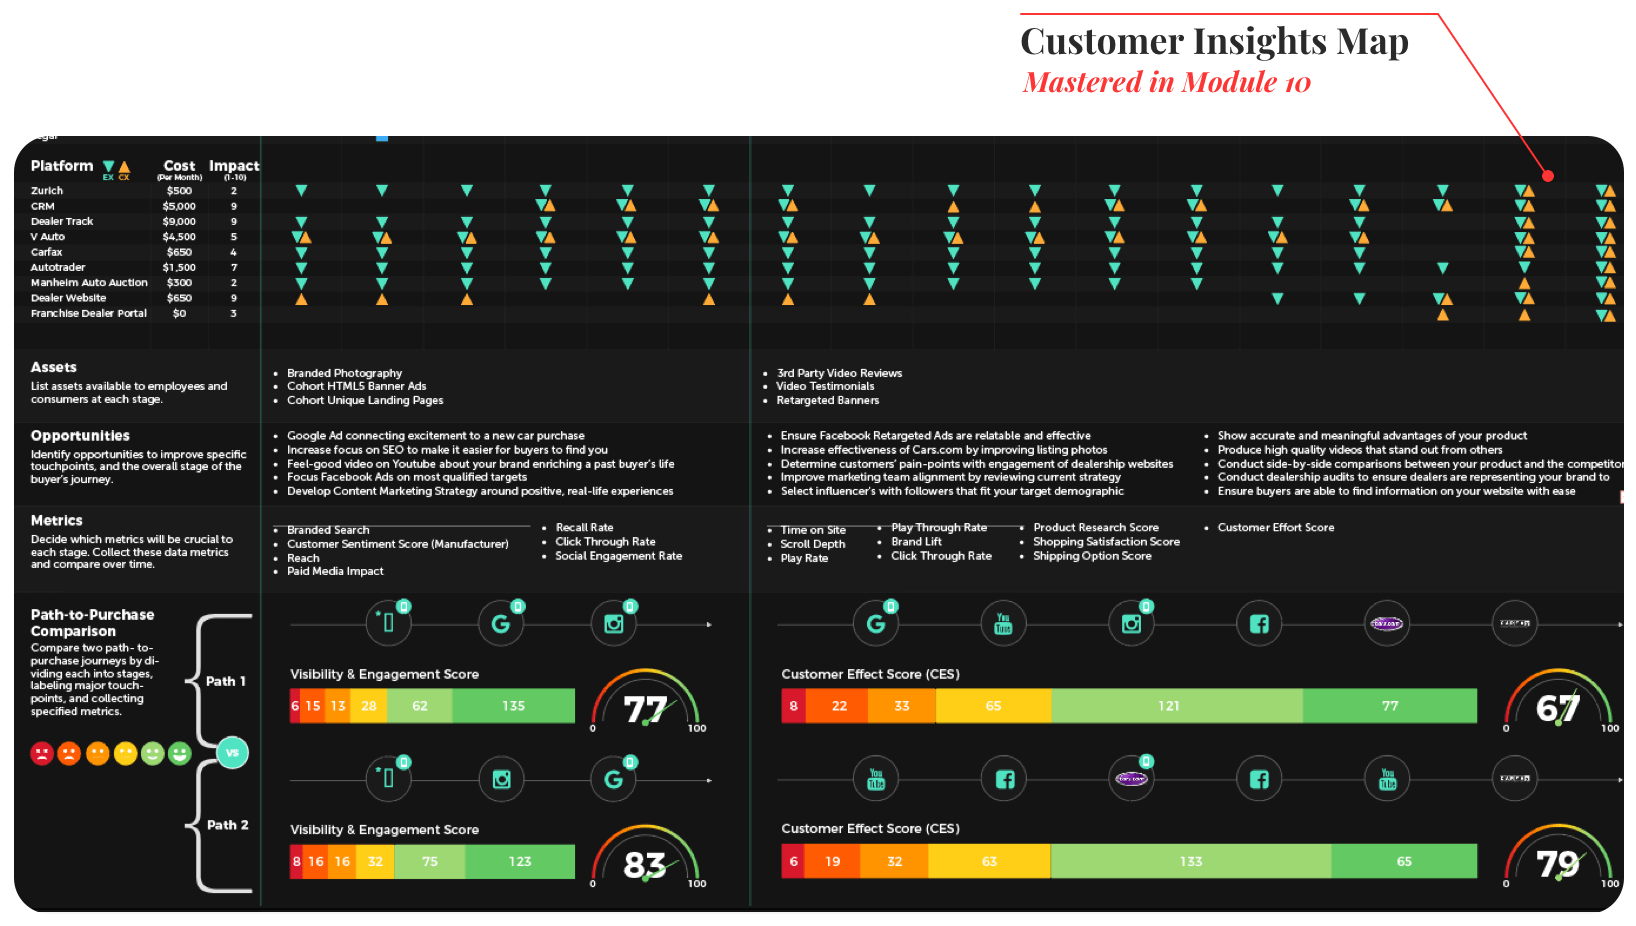 Customer Insights Map